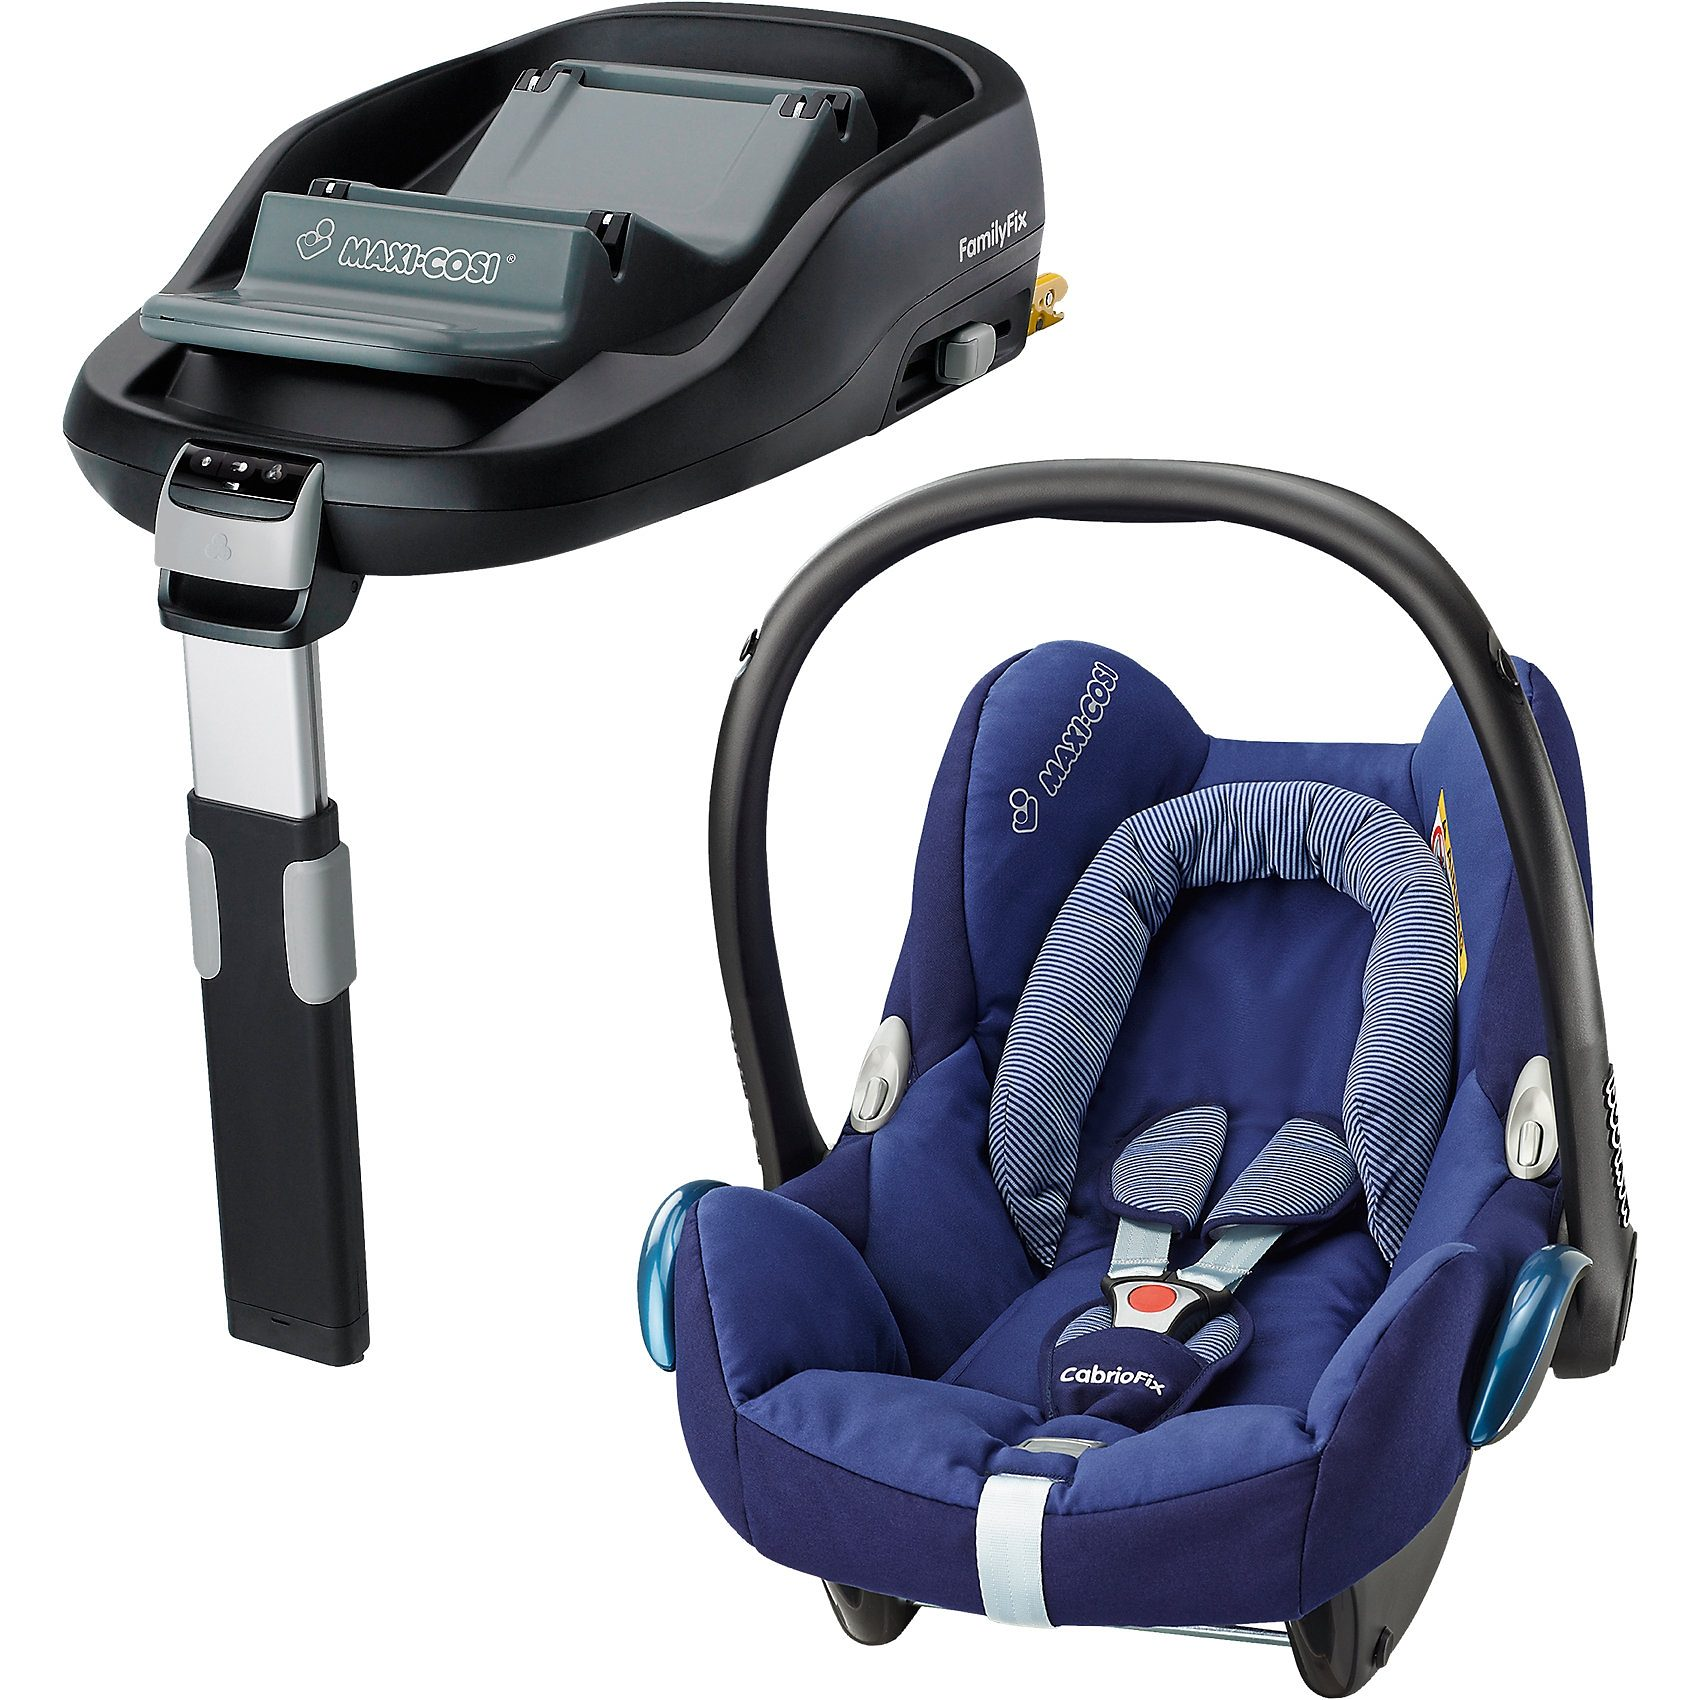 Maxi-Cosi Babyschale Cabriofix, river blue, inkl. FamilyFix